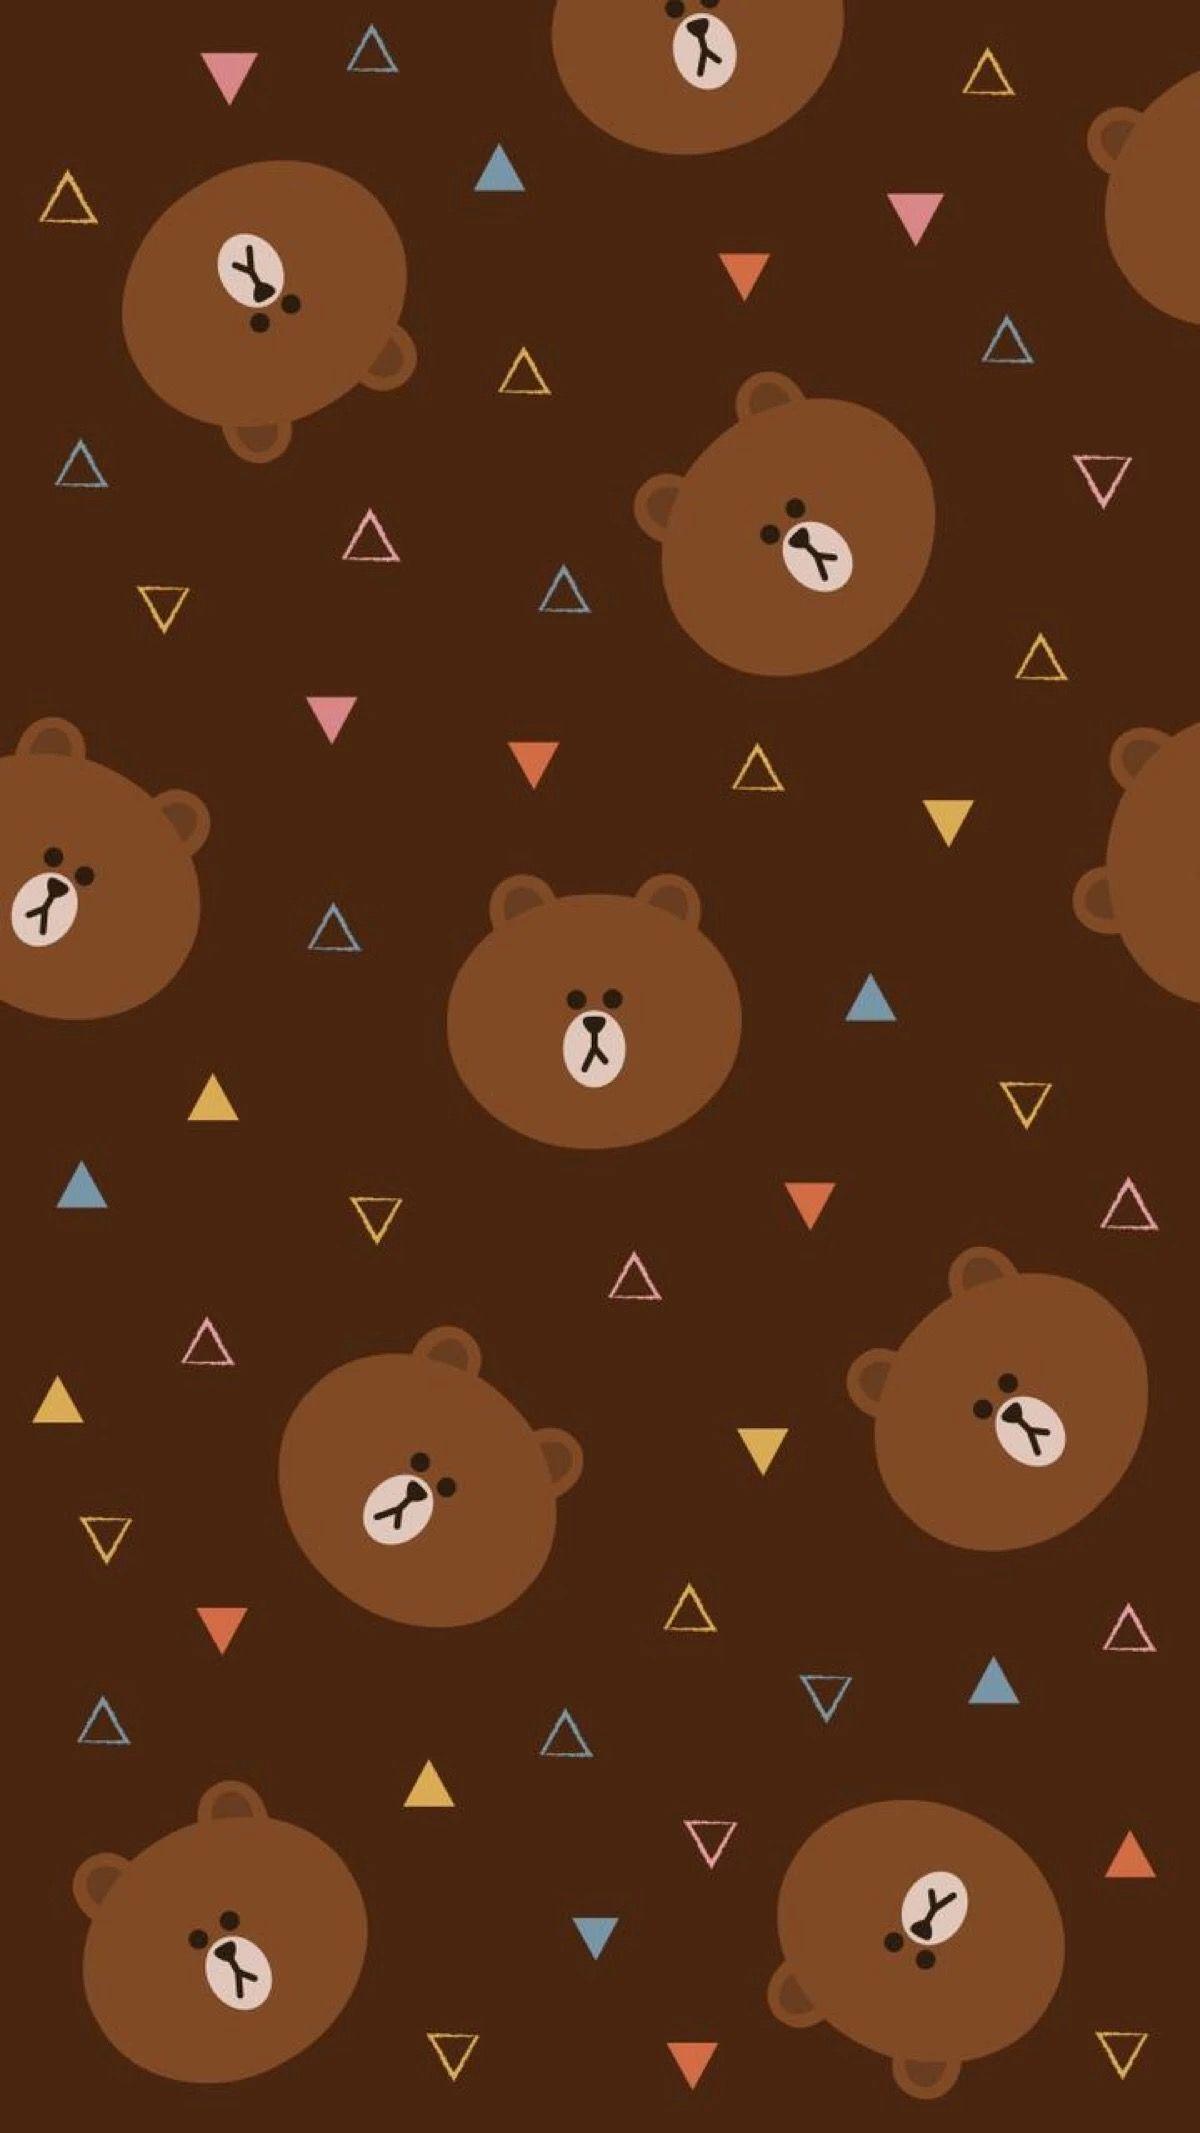 70537636 - Line Brown Wallpaper Line , HD Wallpaper & Backgrounds